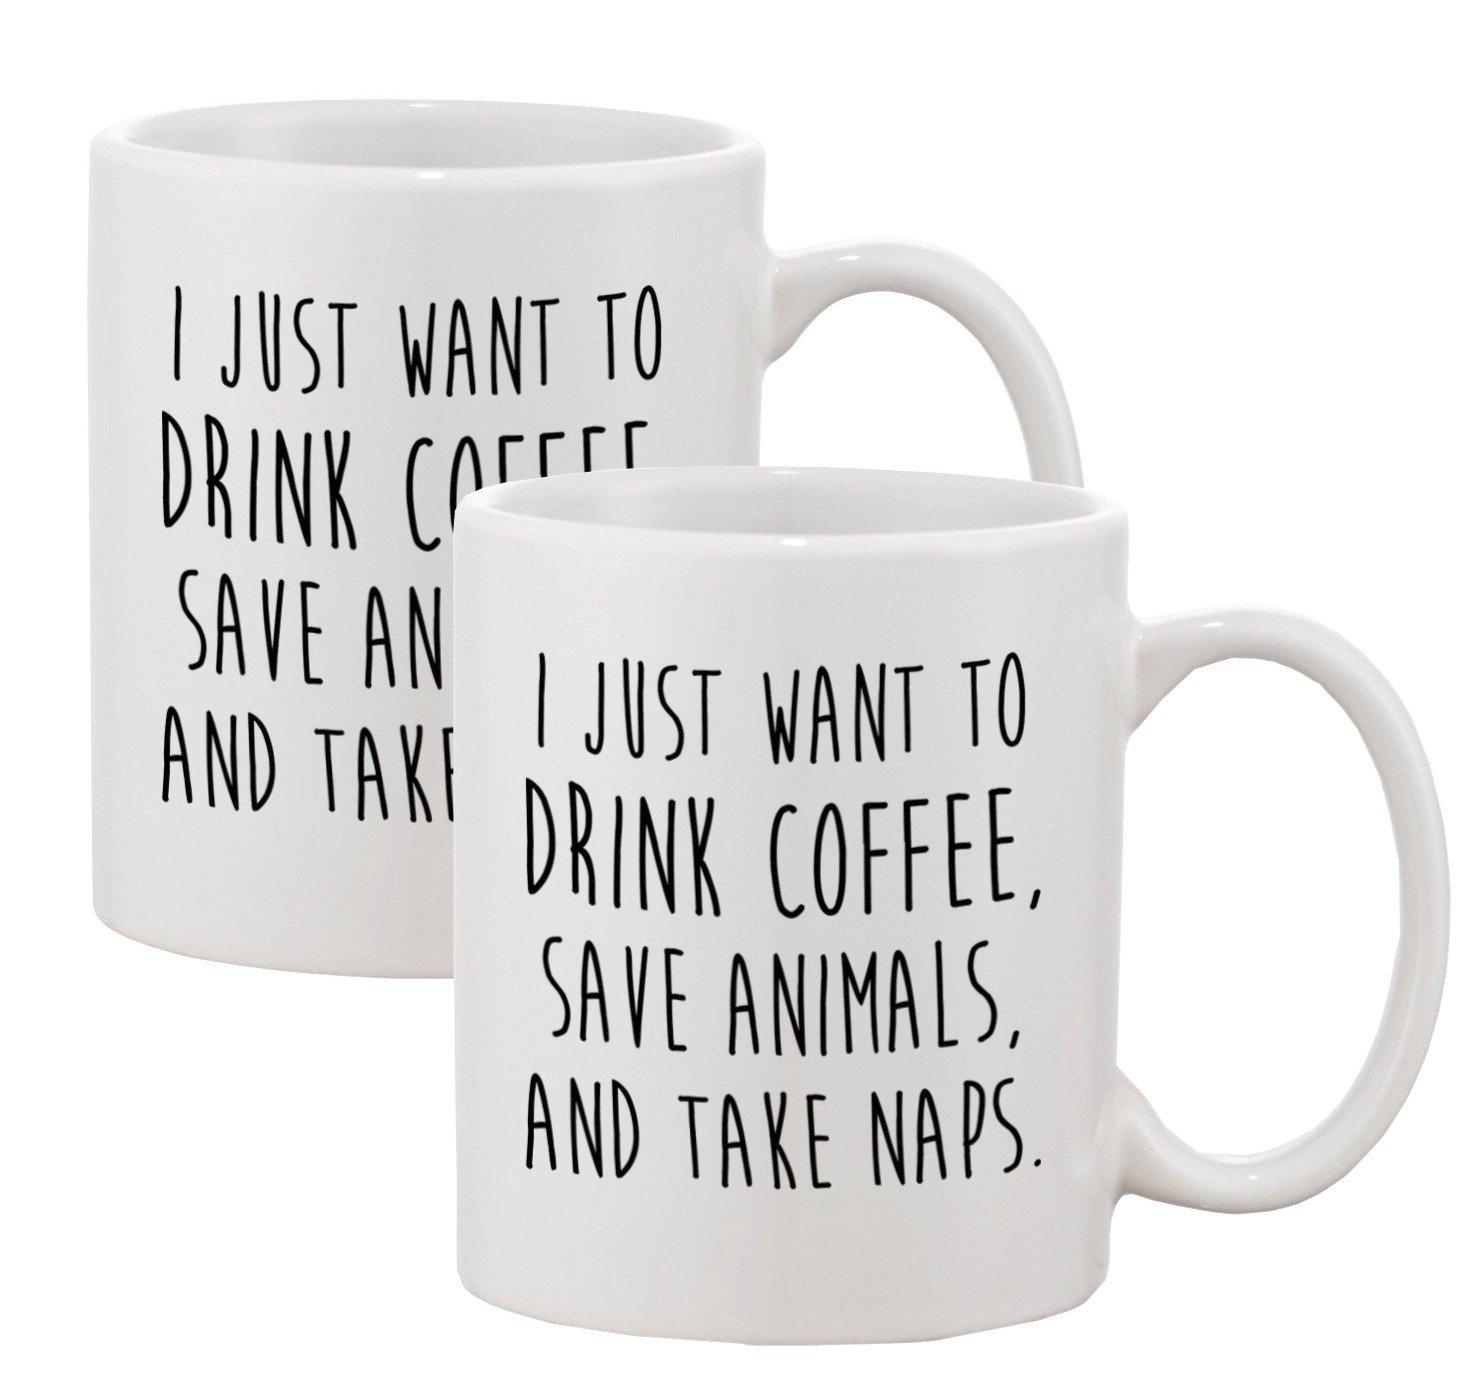 P&B I Just Want to Drink Coffee Save Animals Take Naps Ceramic Coffee Mugs 11 oz (11 oz. (Set of 2), White)